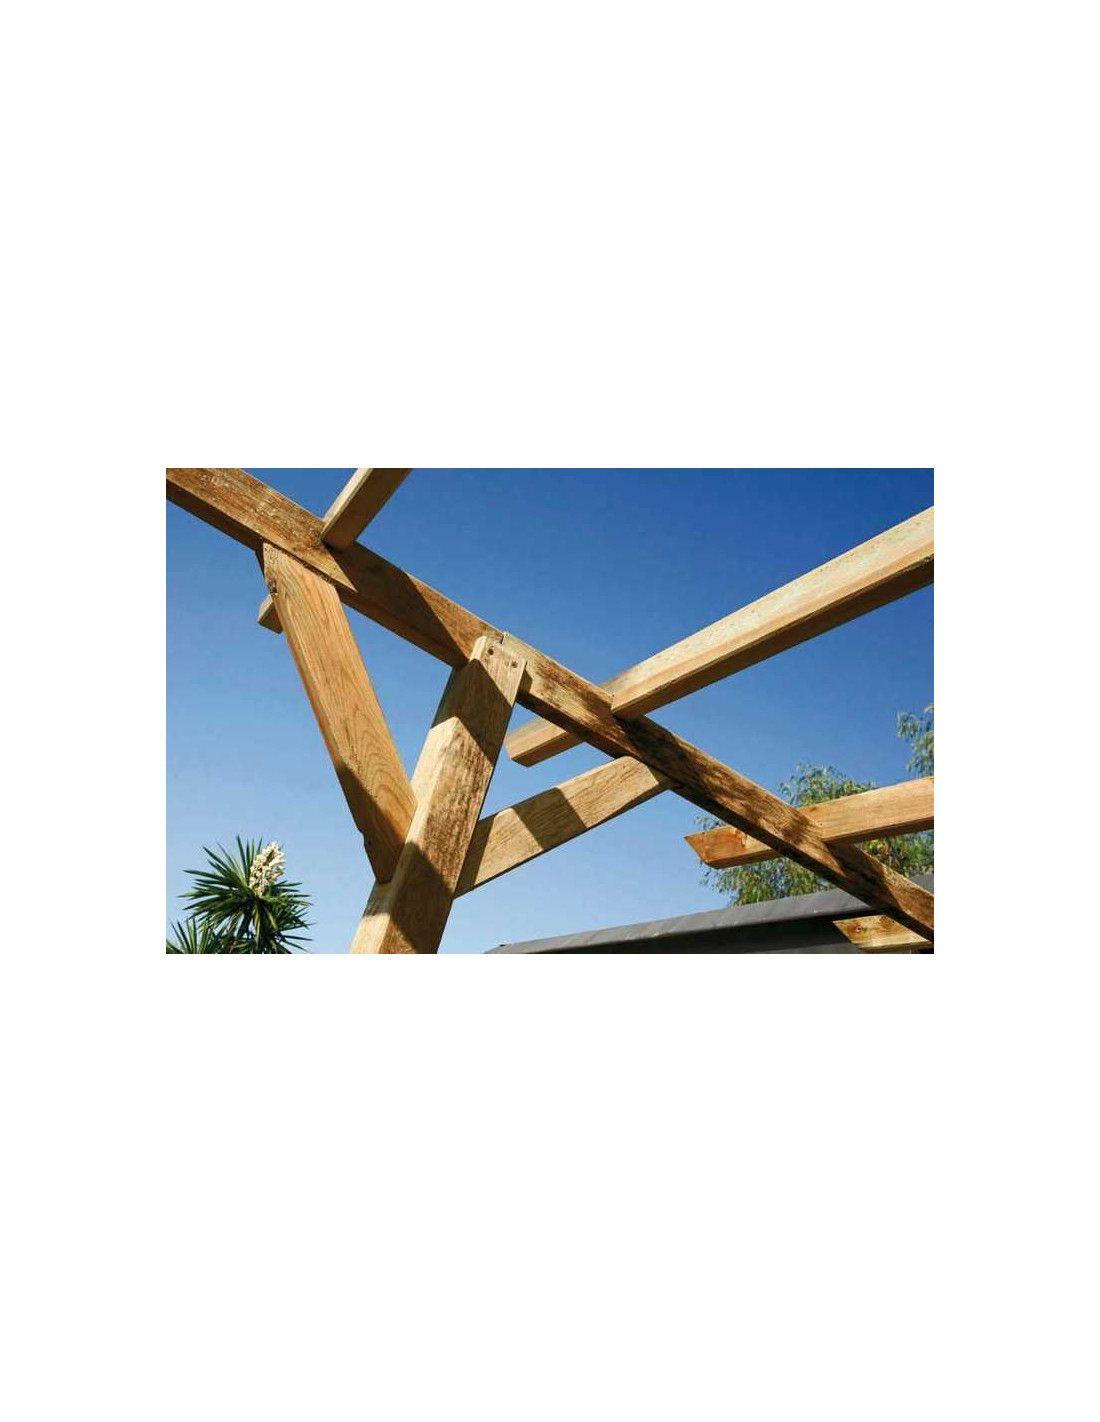 P rgola de madera 14 4 m - Postes de madera para pergolas ...